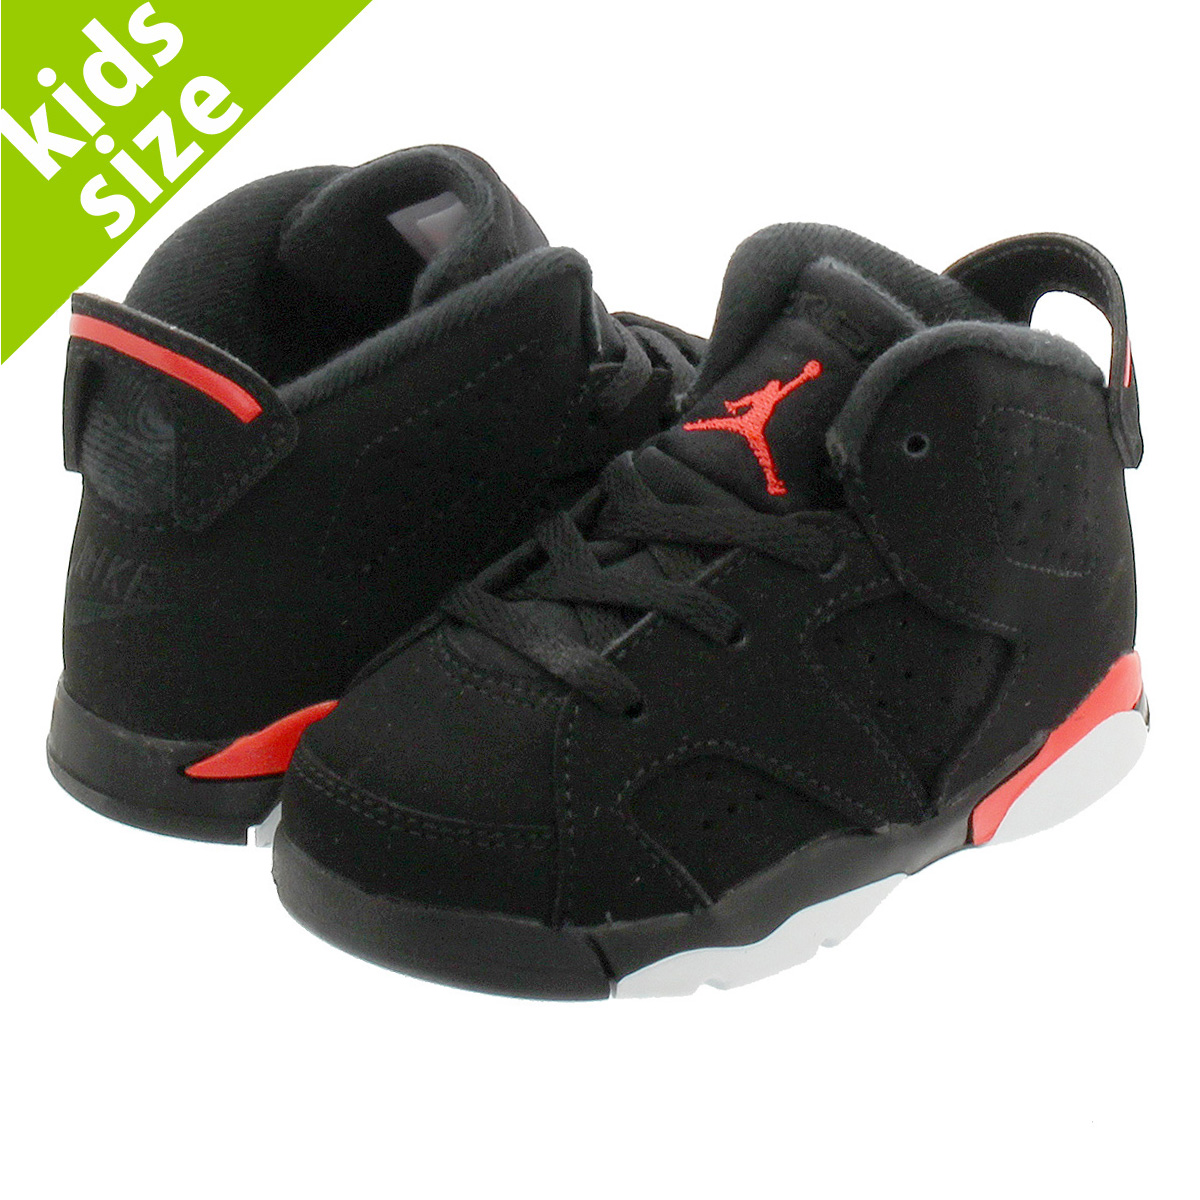 c230dd68d37 LOWTEX BIG-SMALL SHOP: NIKE AIR JORDAN 6 RETRO BT Nike Air Jordan 6  nostalgic BT BLACK/INFRARED 384,667-060   Rakuten Global Market